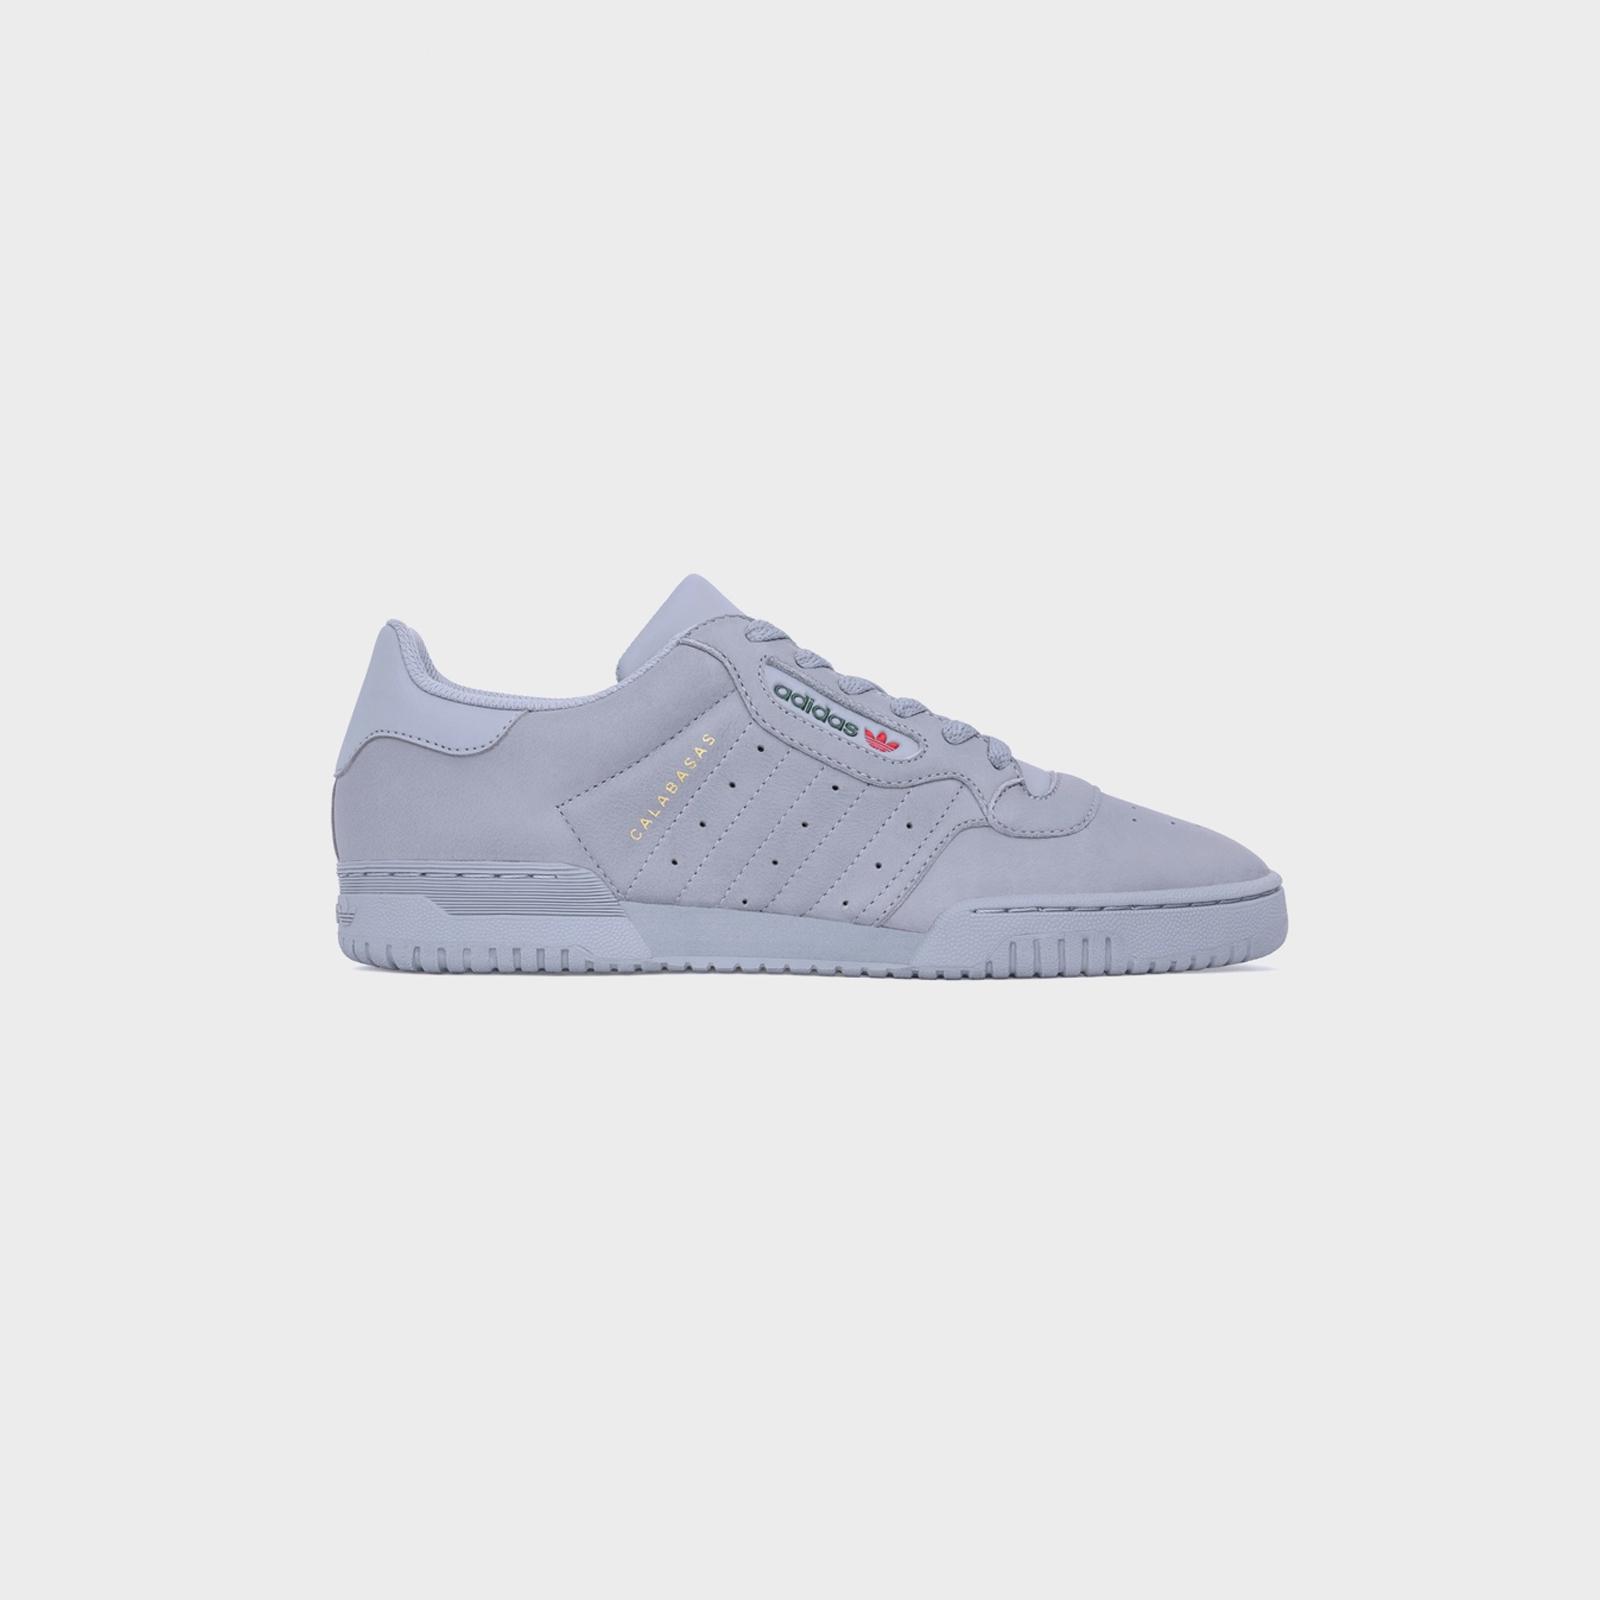 38a16257f08 adidas Originals x Kanye West Yeezy Powerphase